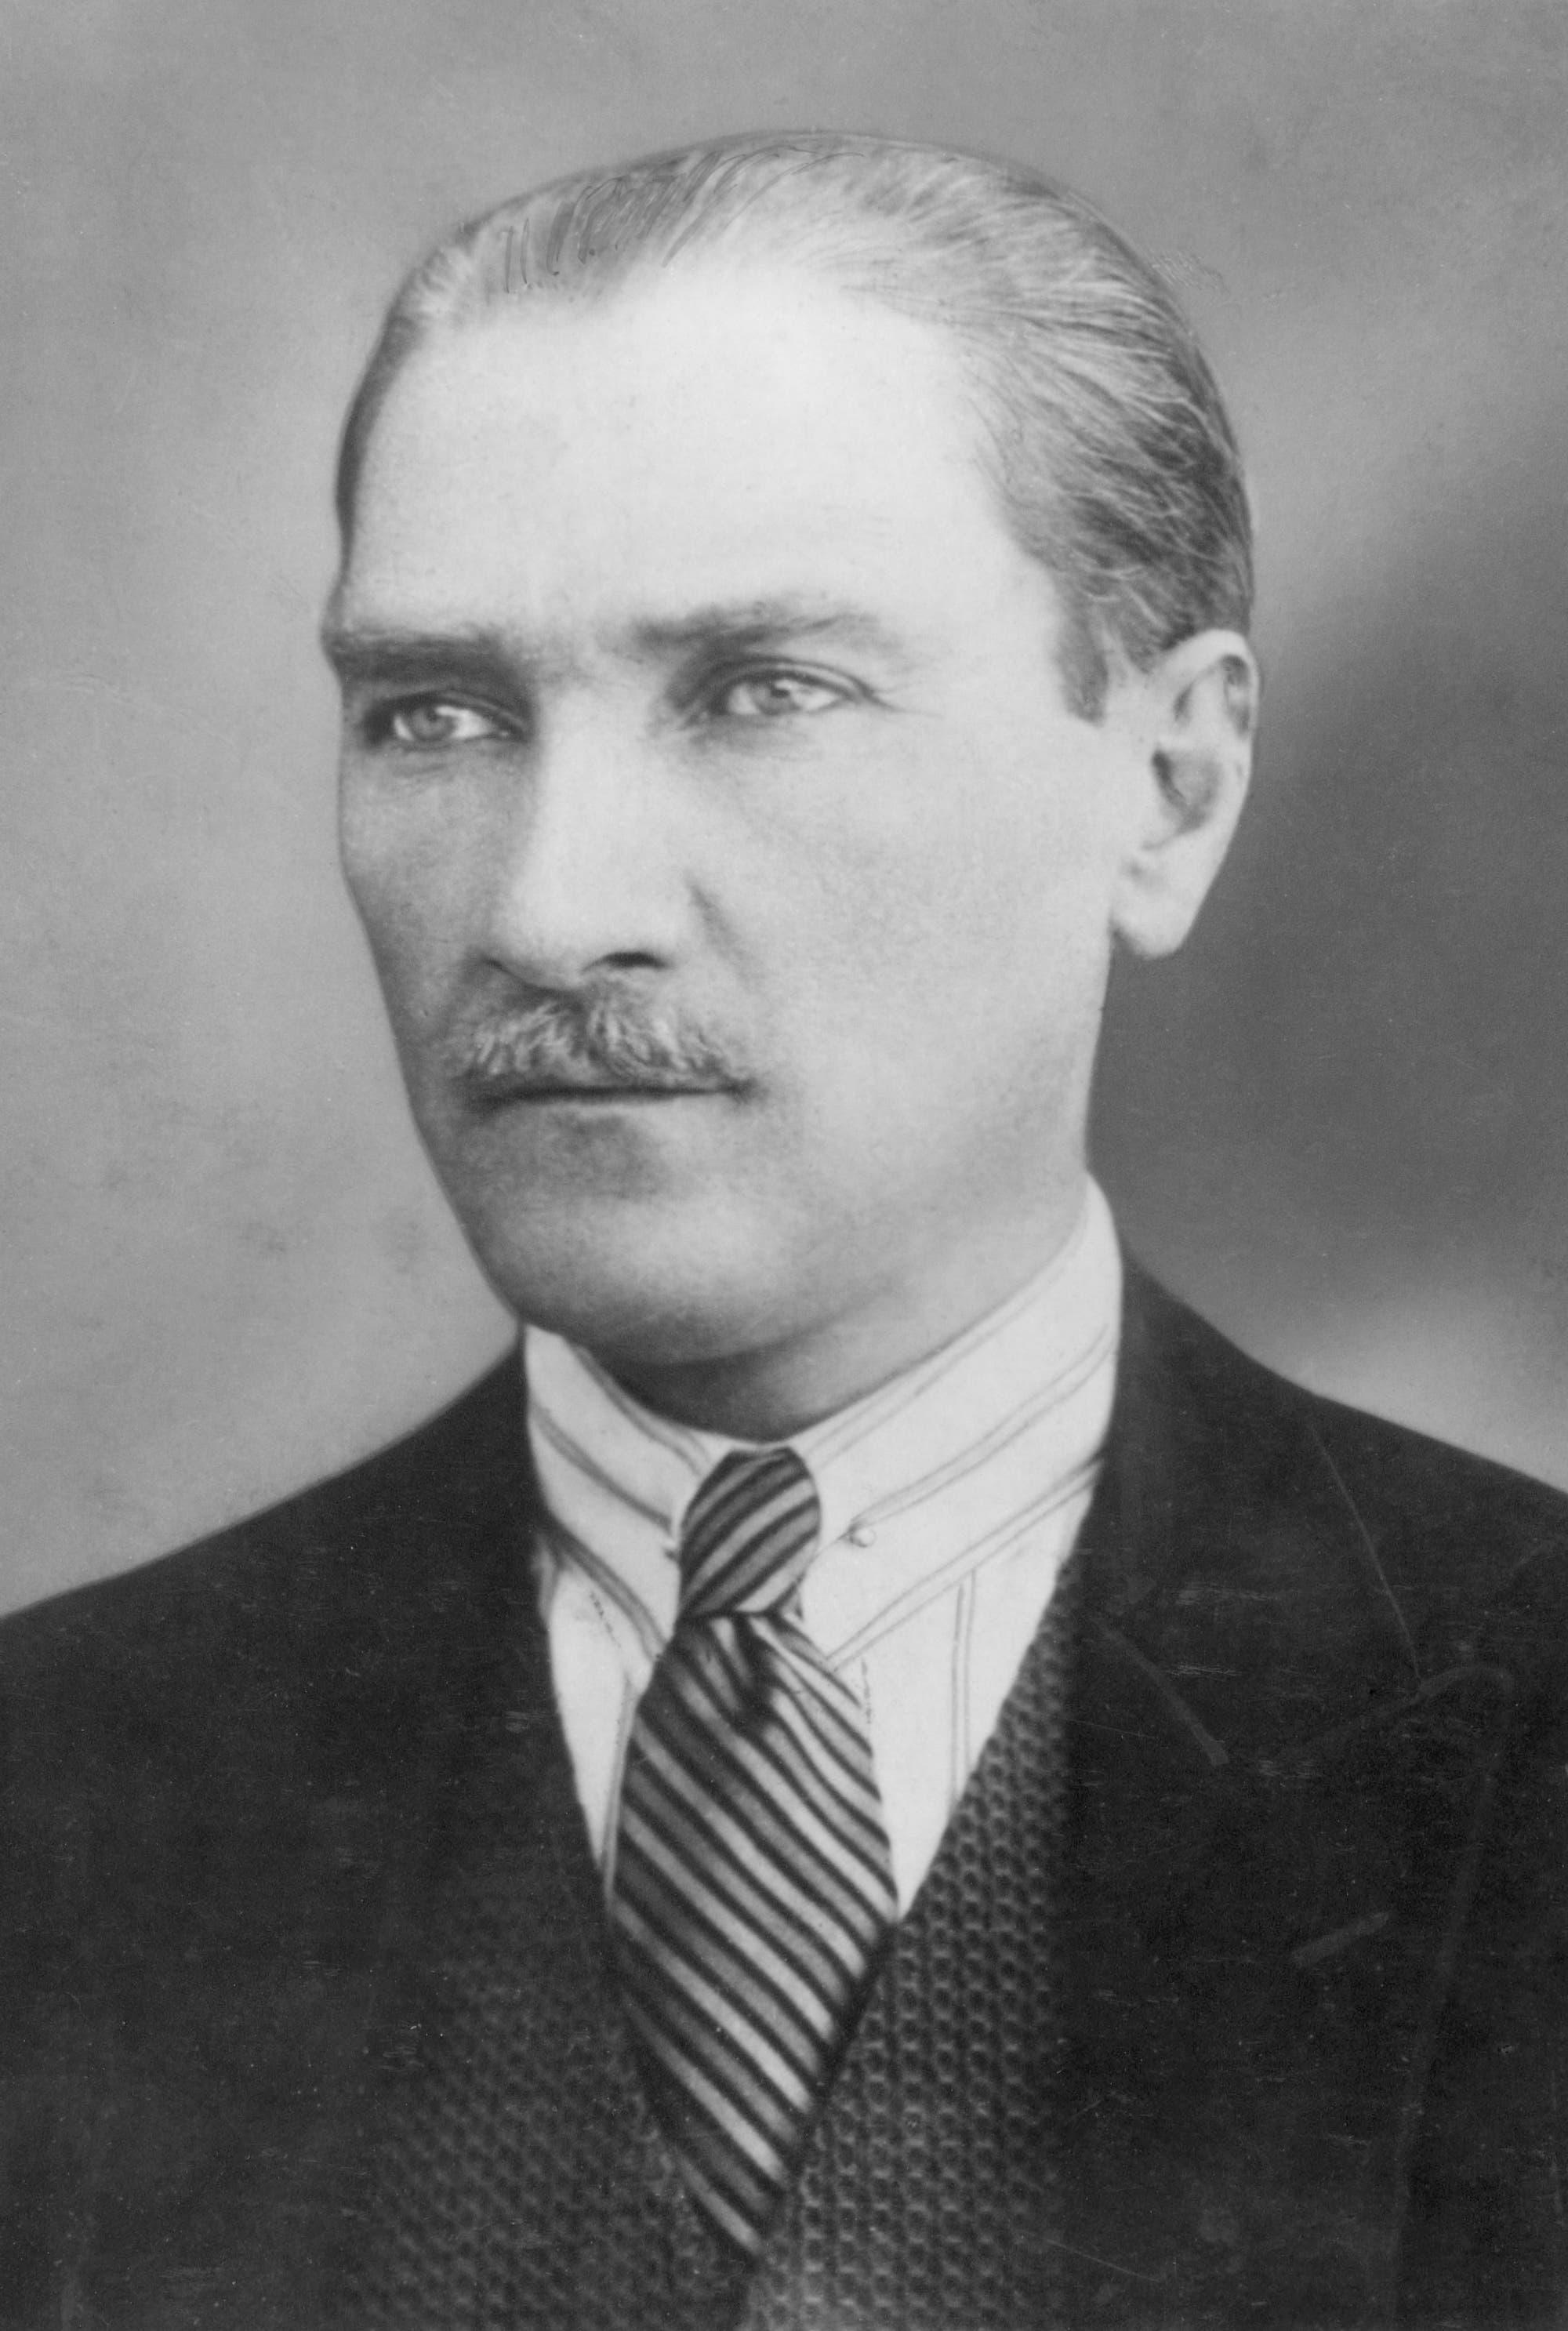 Mustafa Kemal um 1925